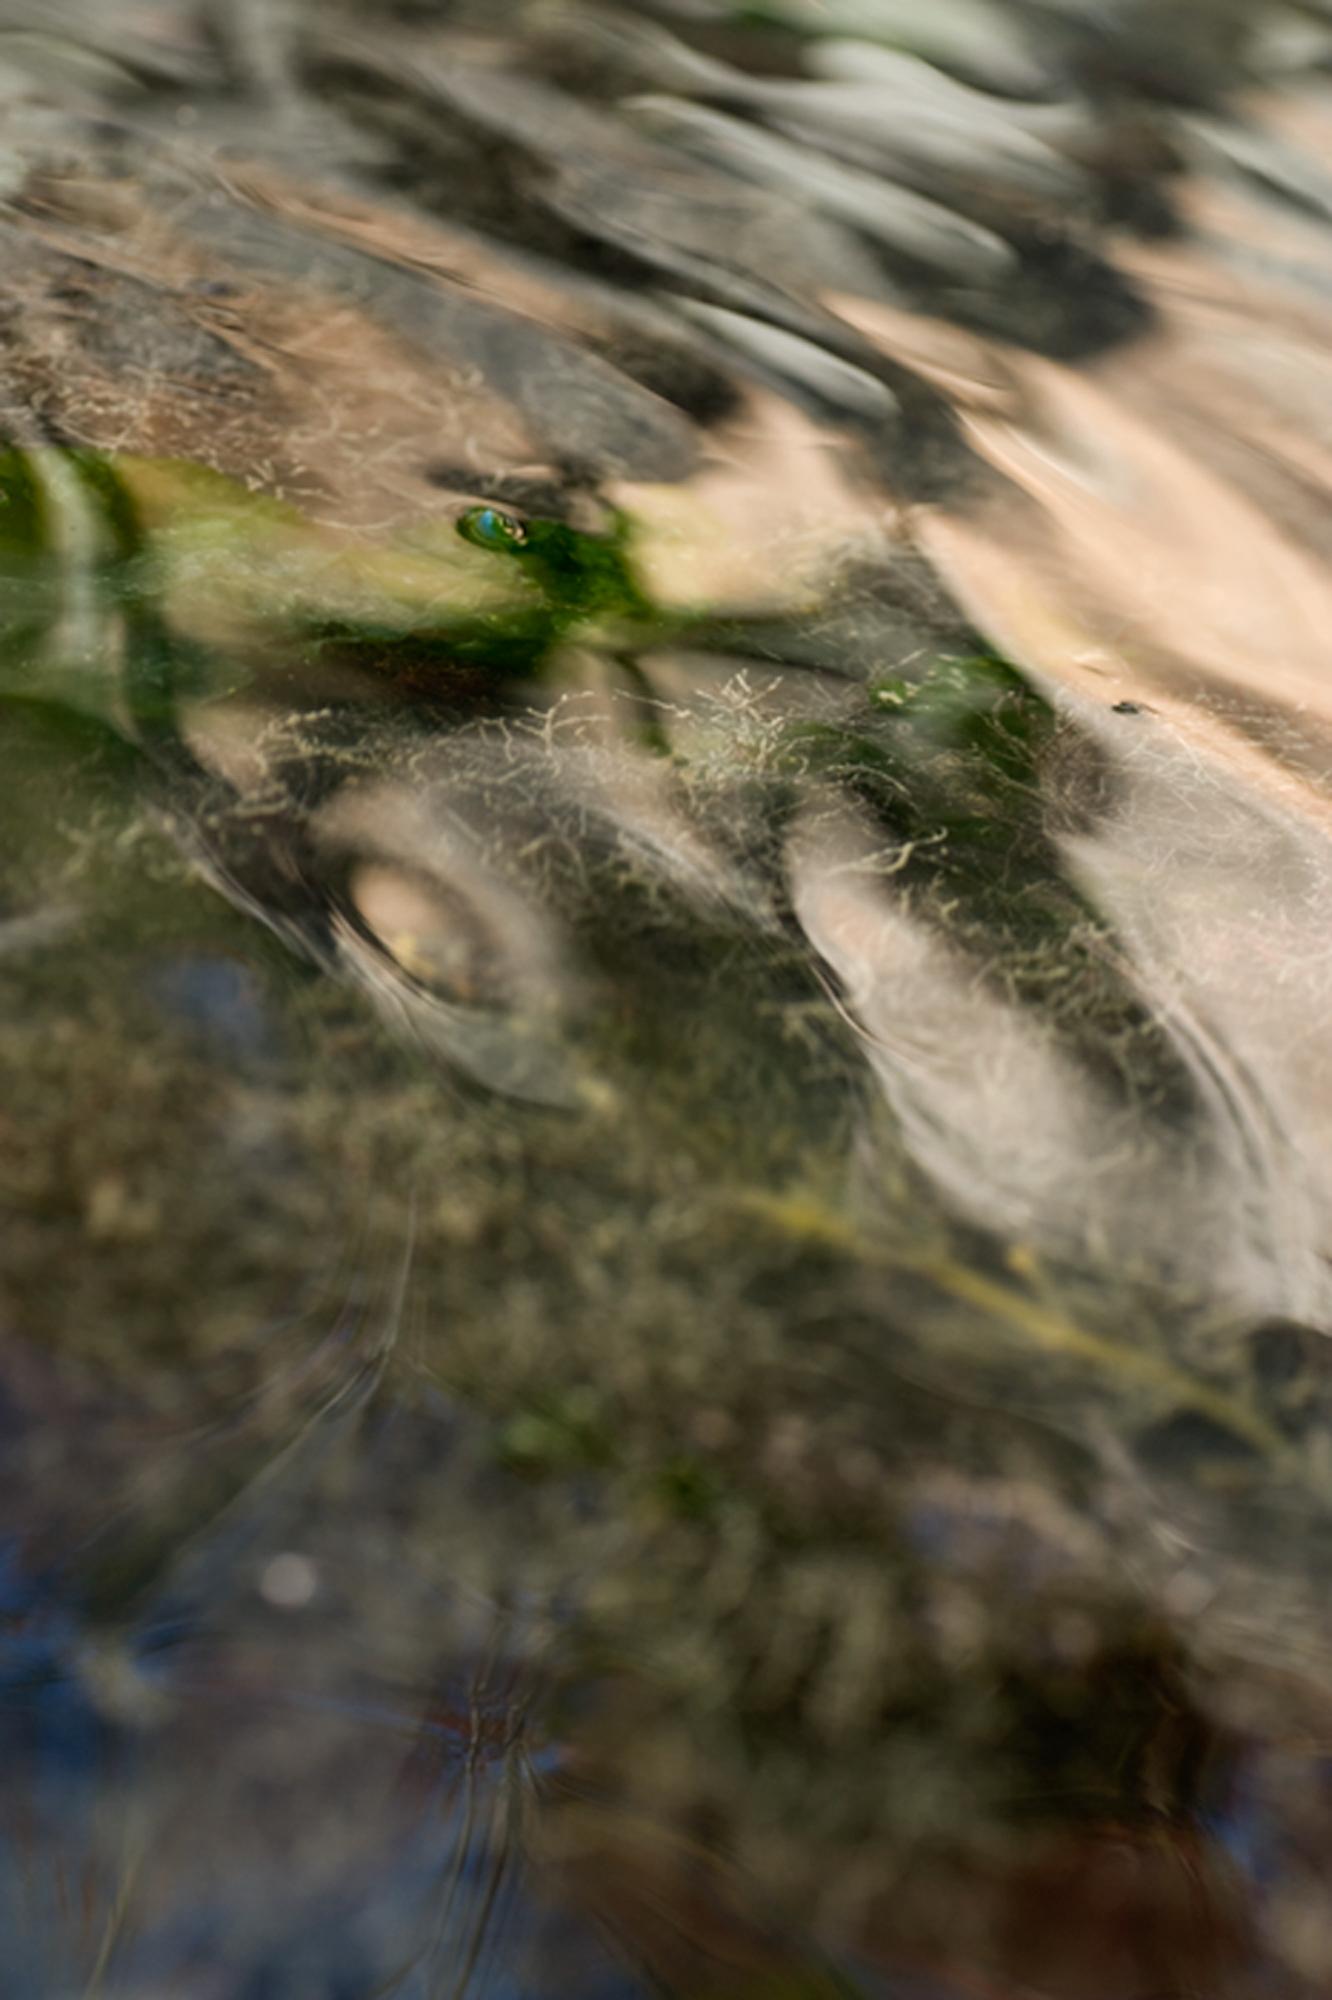 Shimmering Shoal, 2011 (Touching the Farm River)